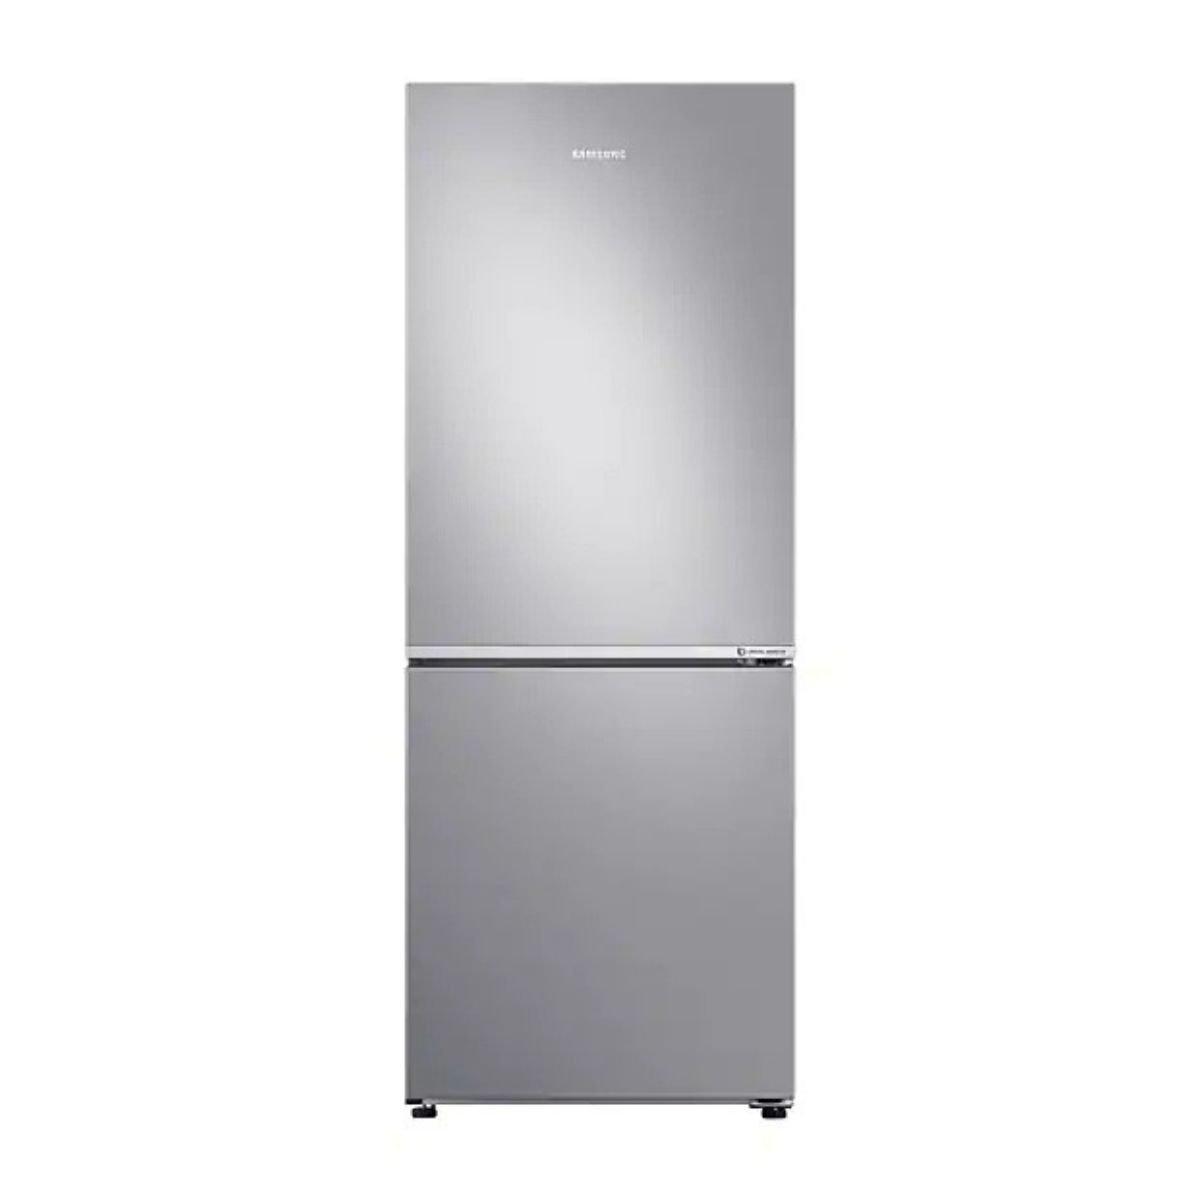 RB-27N4050S8 SH Refrigerator